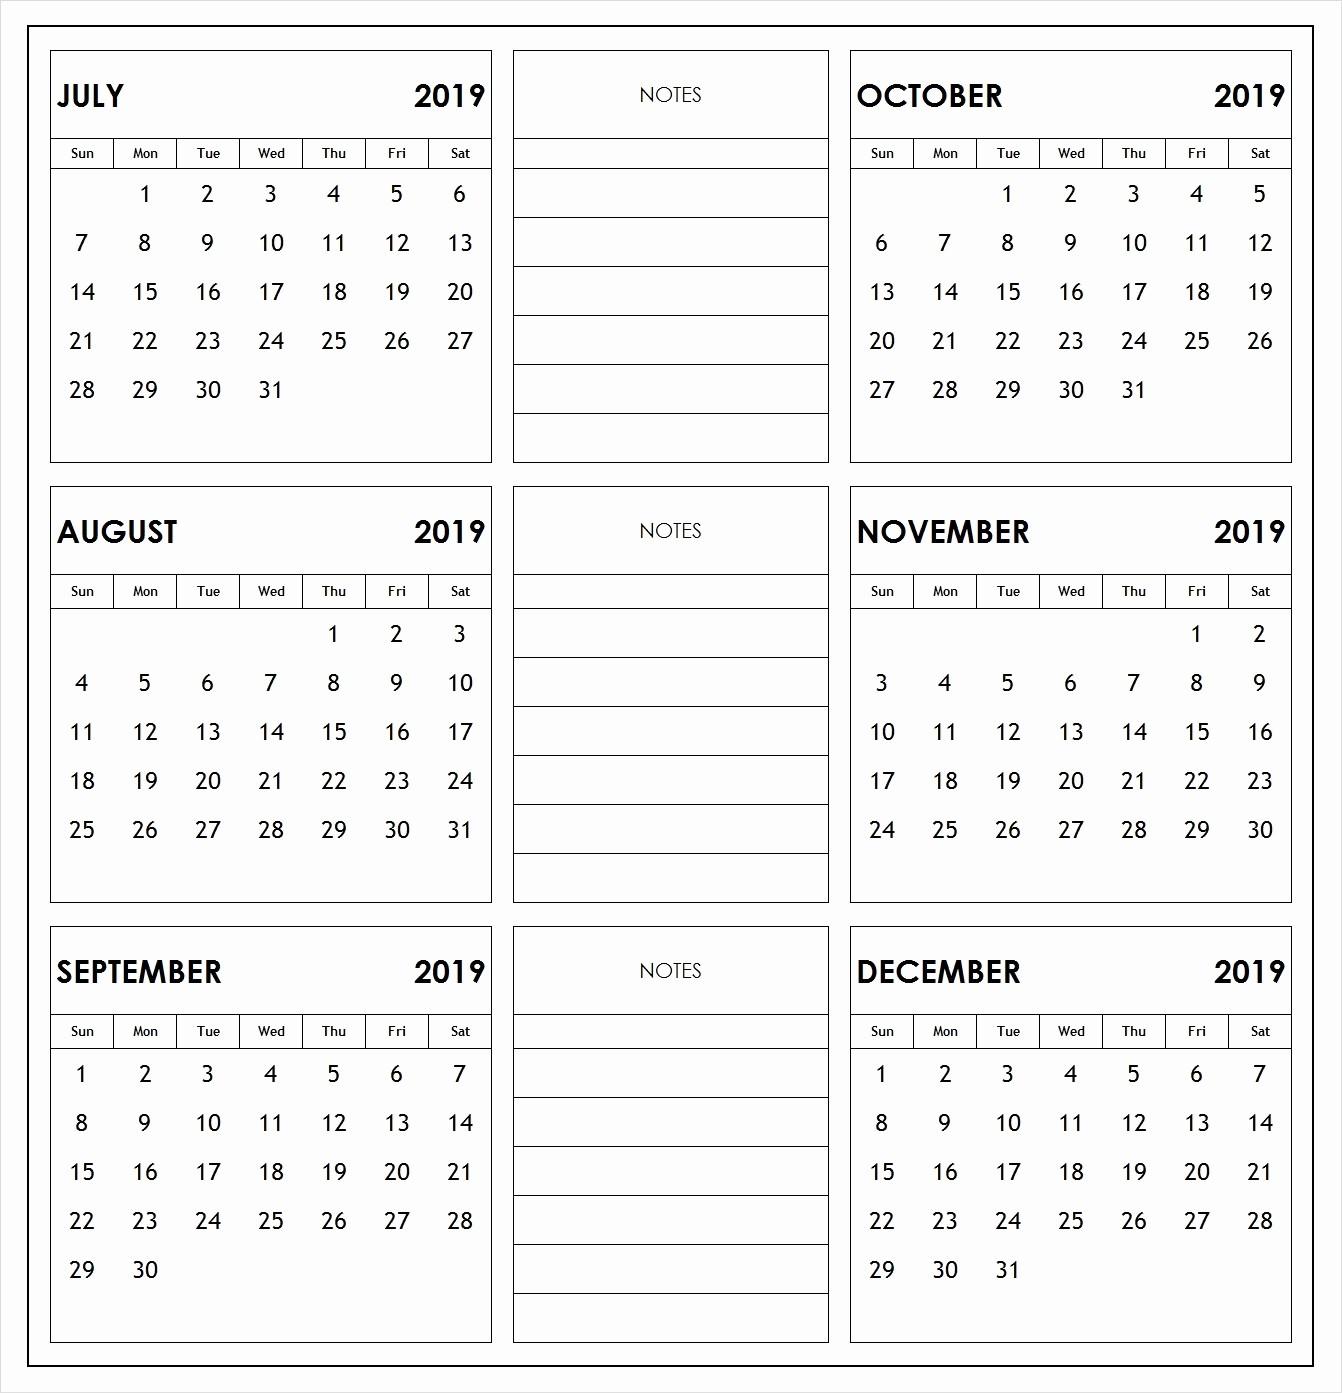 2019 Printable Calendar by Month Elegant 2019 6 Months Half Year Calendar Printable Download